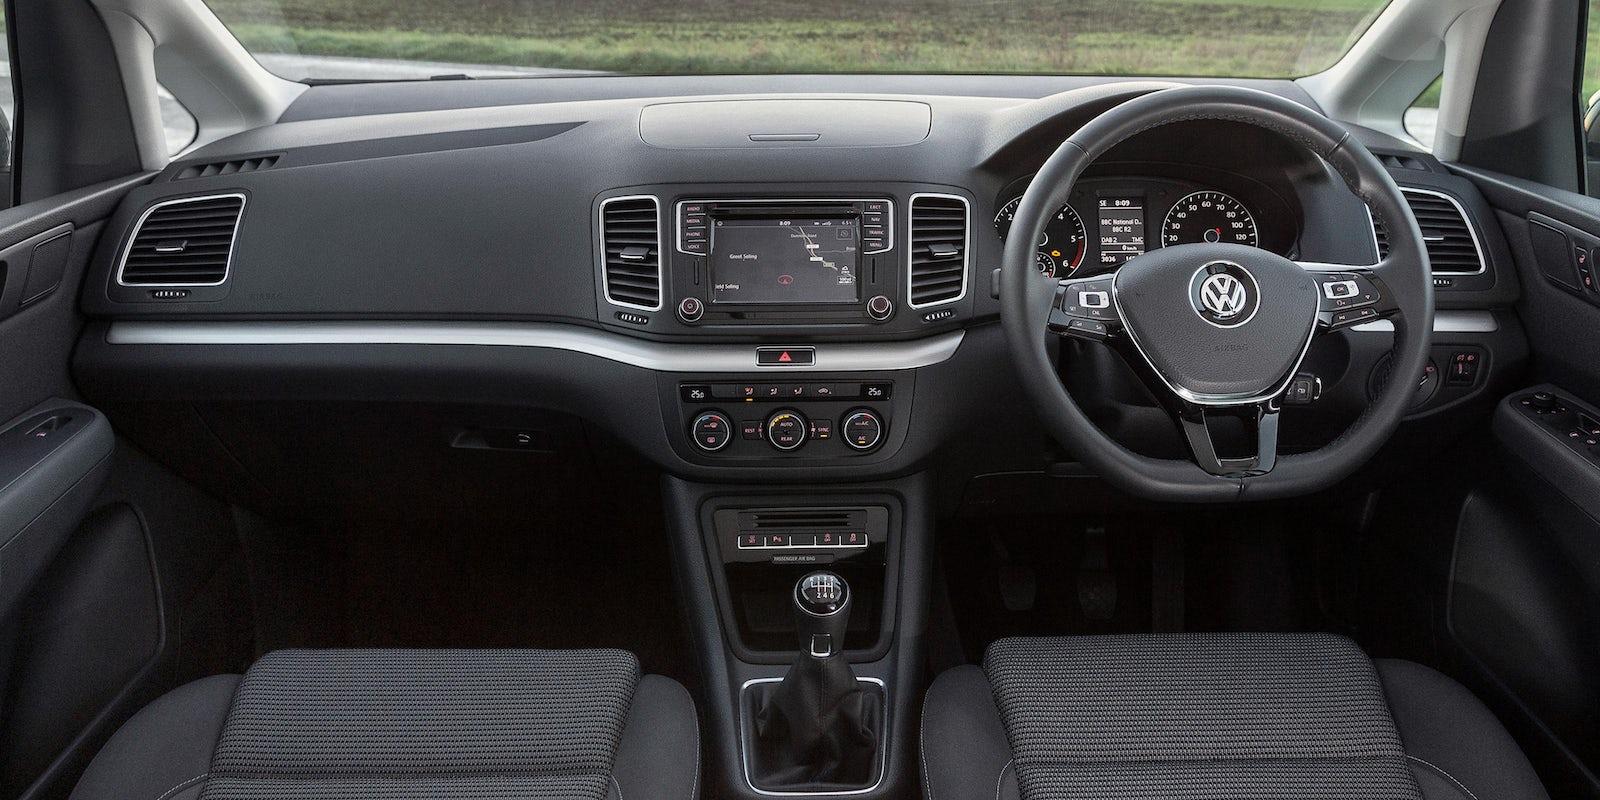 Volkswagen Sharan Interior & Infotainment | carwow